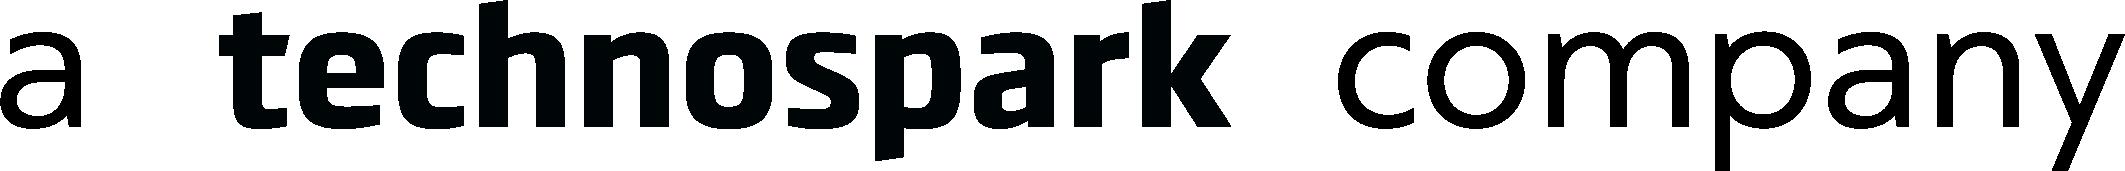 a technospark company